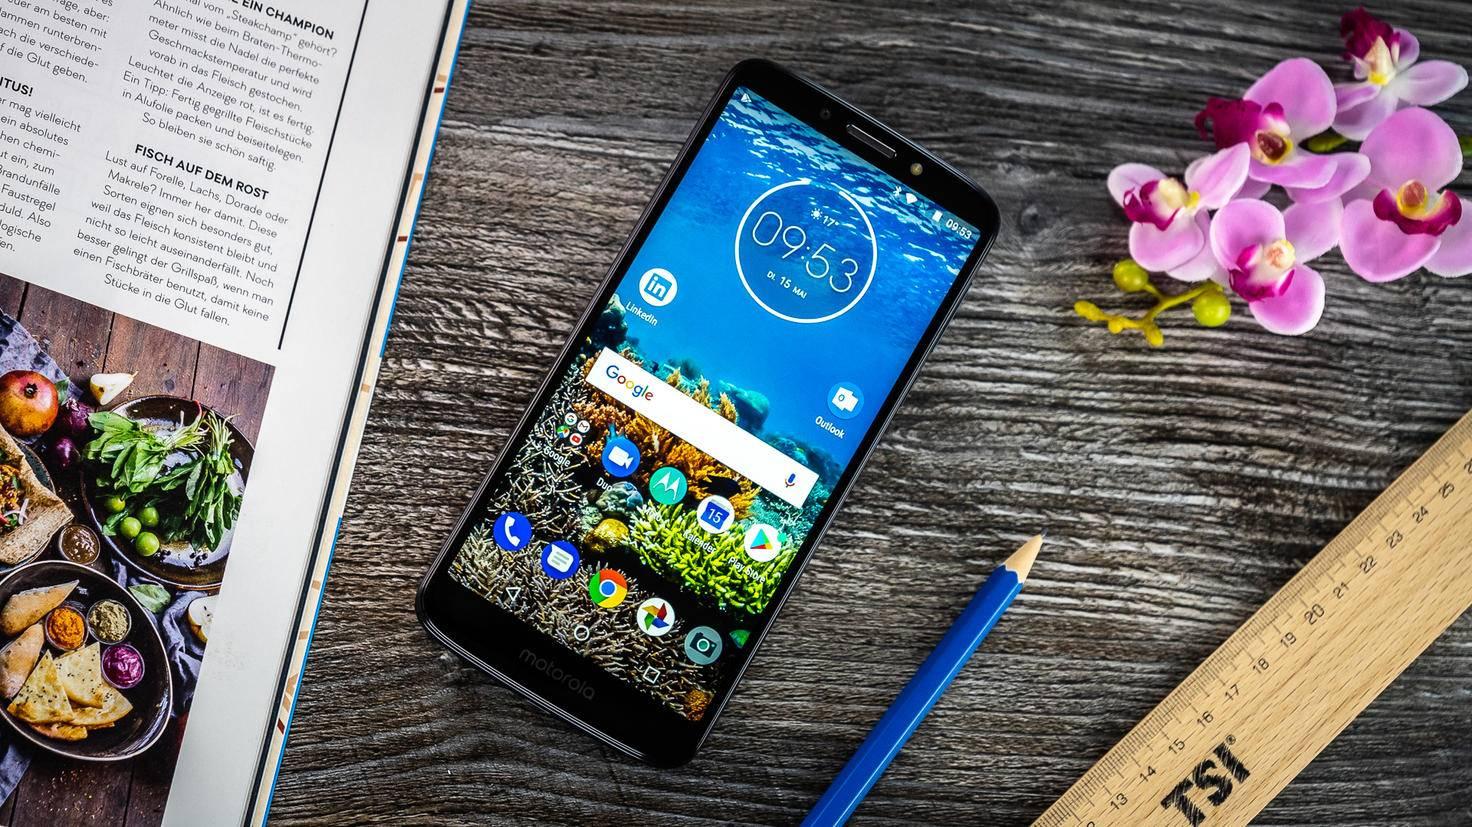 Motorola-Moto-G6-Play-TURN-ON-1